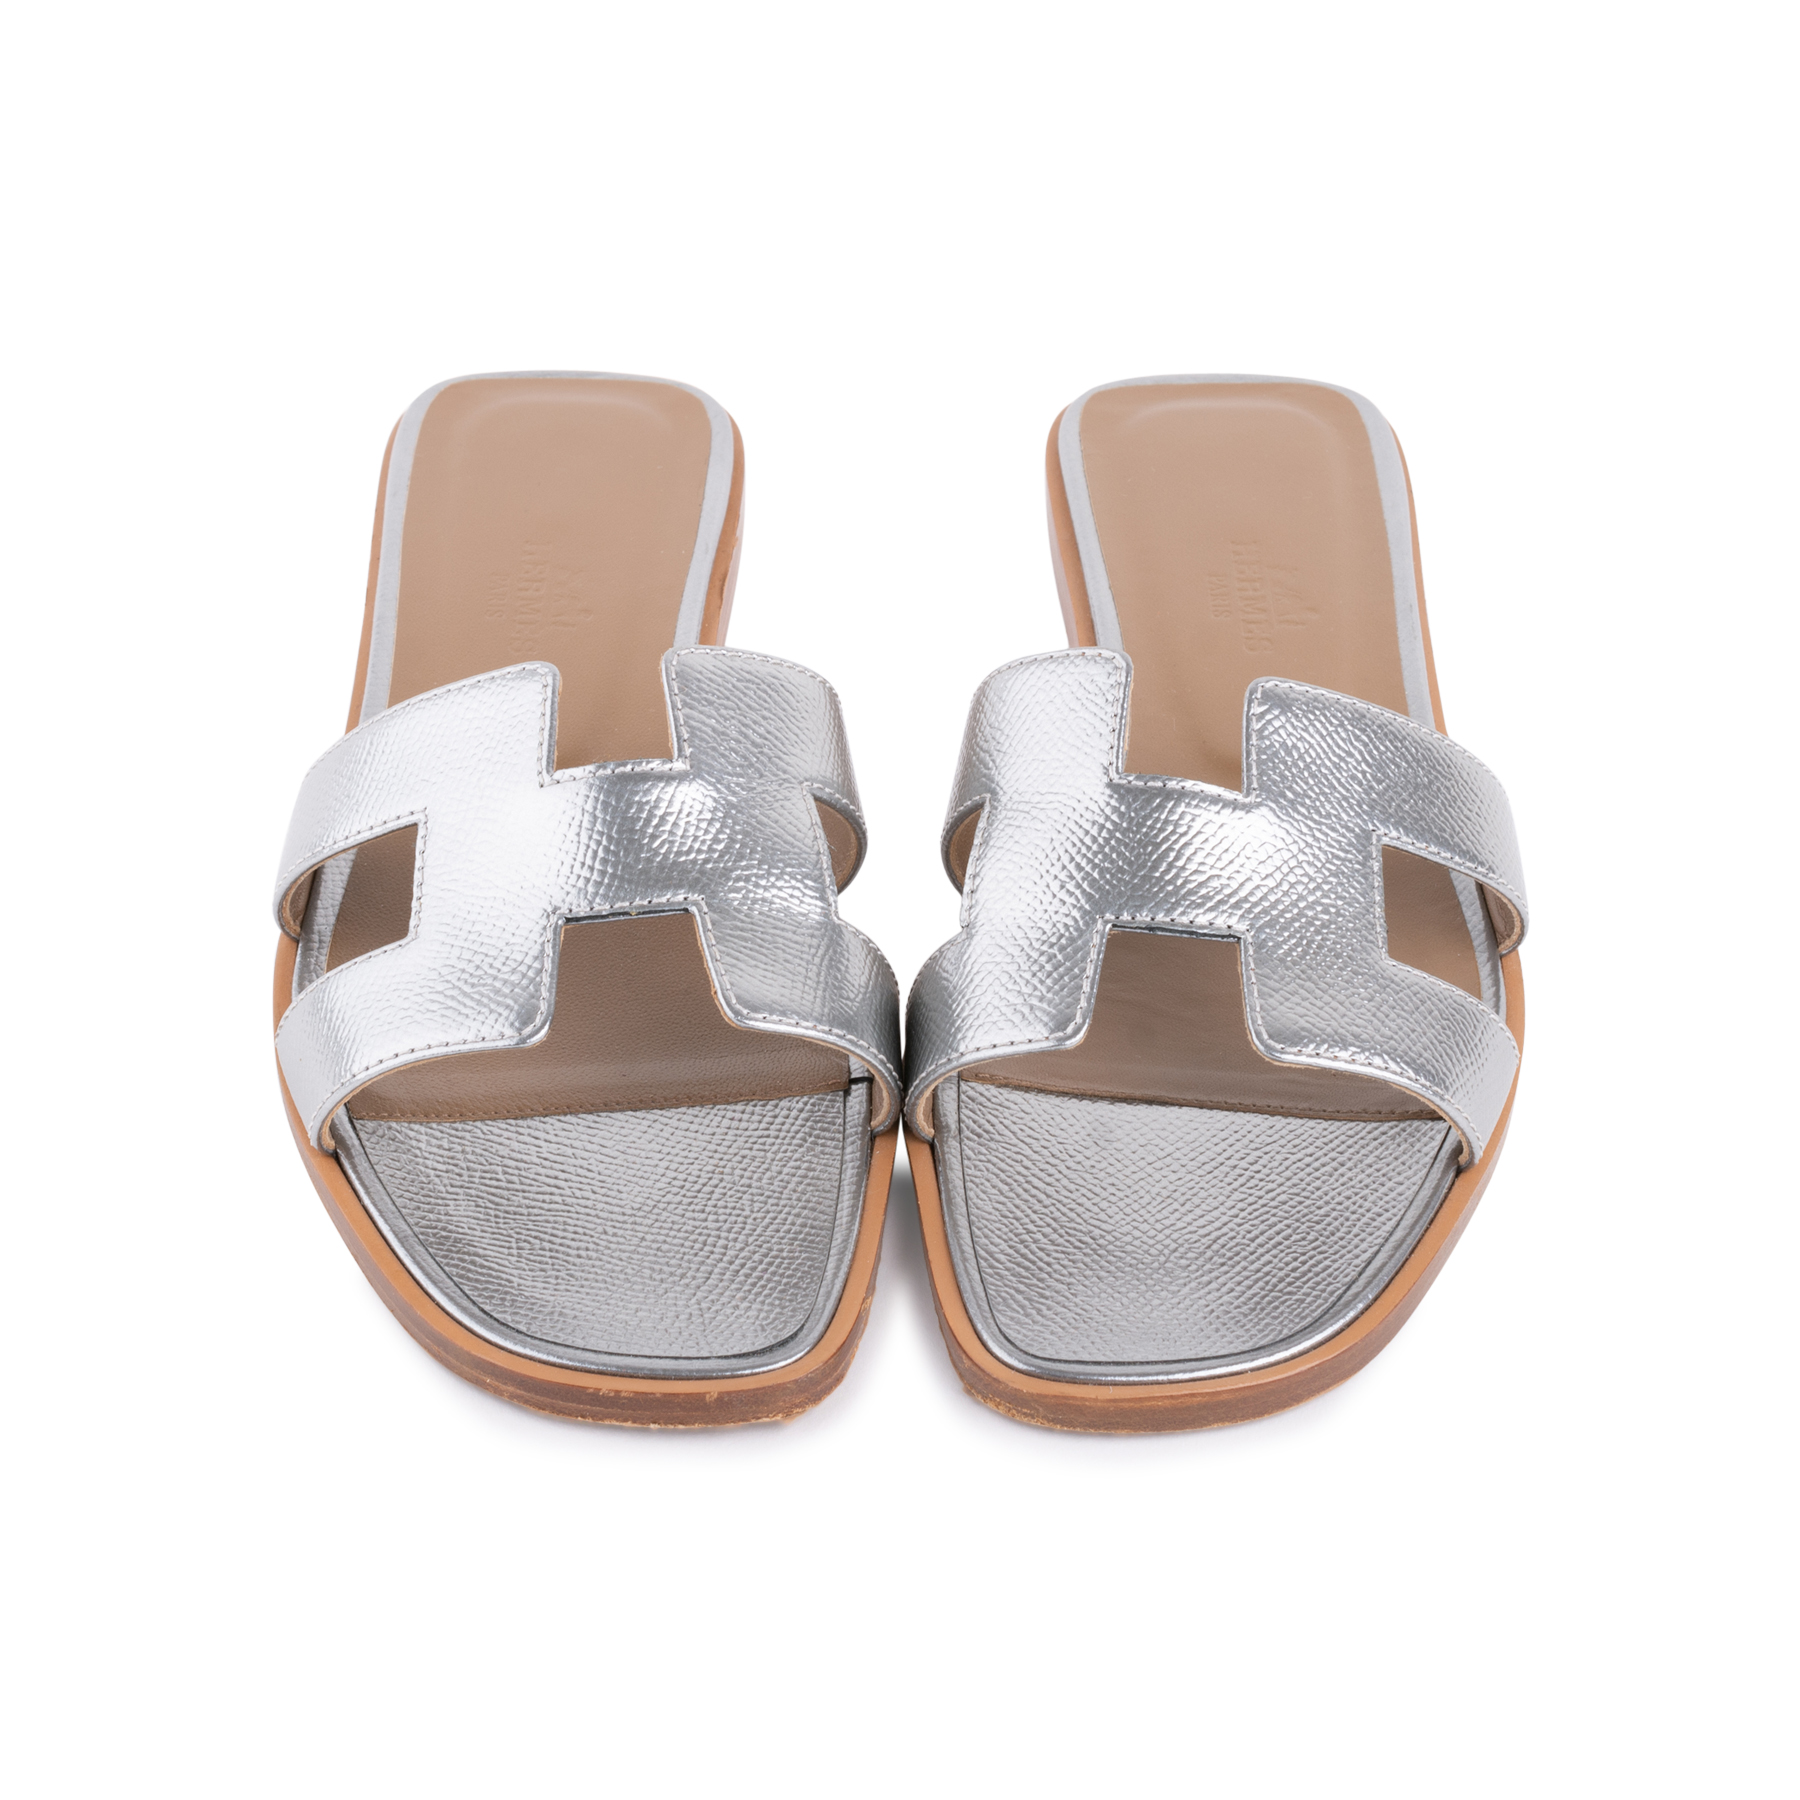 00dddb788c3d Authentic Second Hand Hermès Metallic Epsom Oran Sandals (PSS-126-00139)